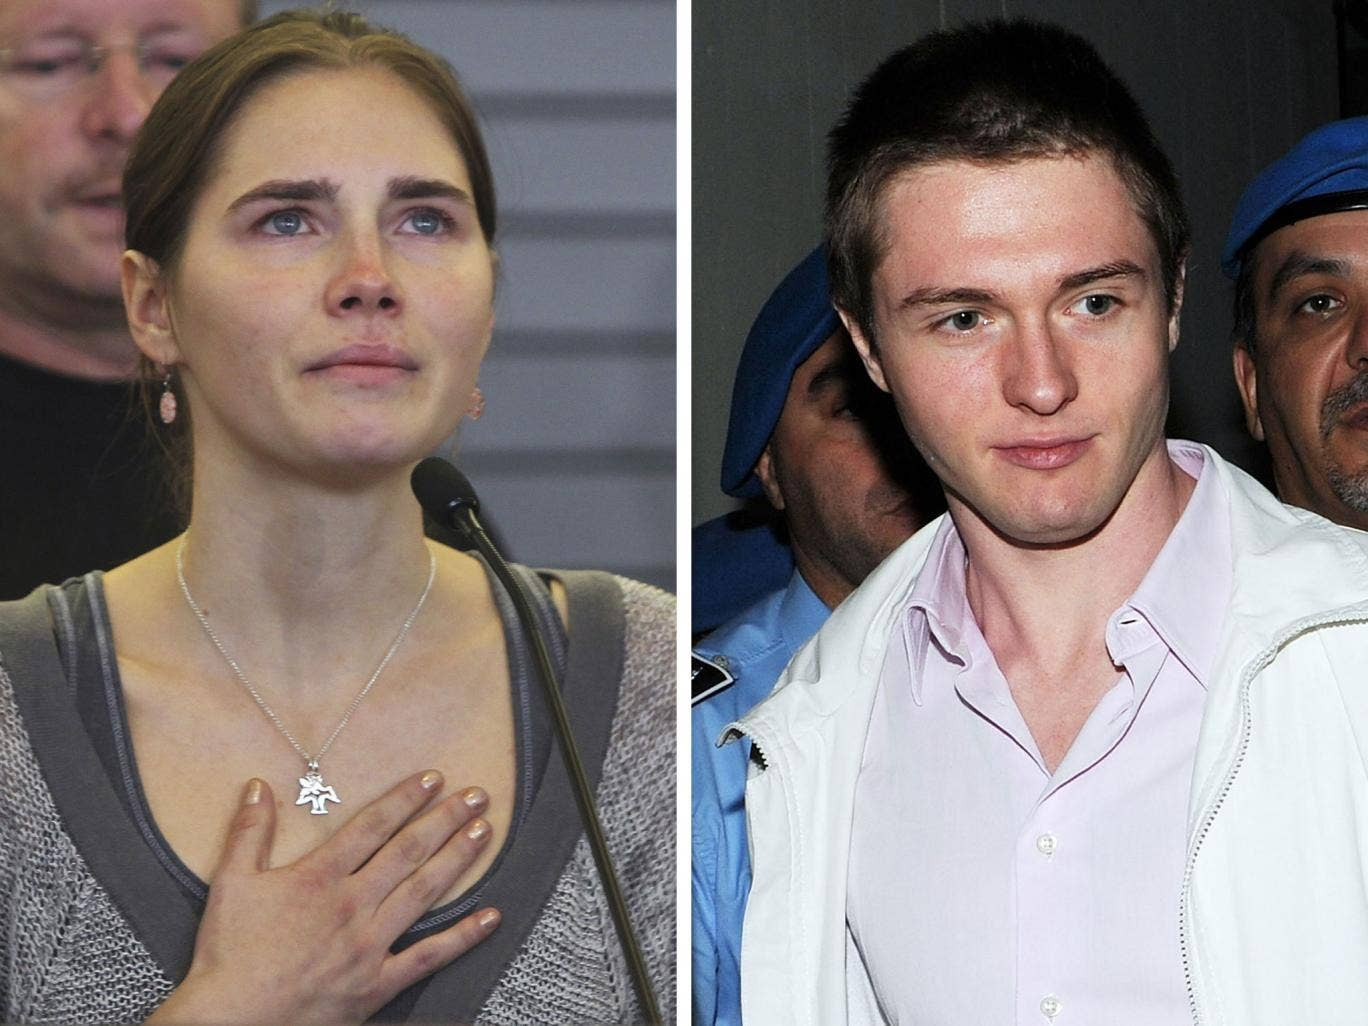 Amanda Knox and her ex-boyfriend Raffaele Sollecito will be re-tried